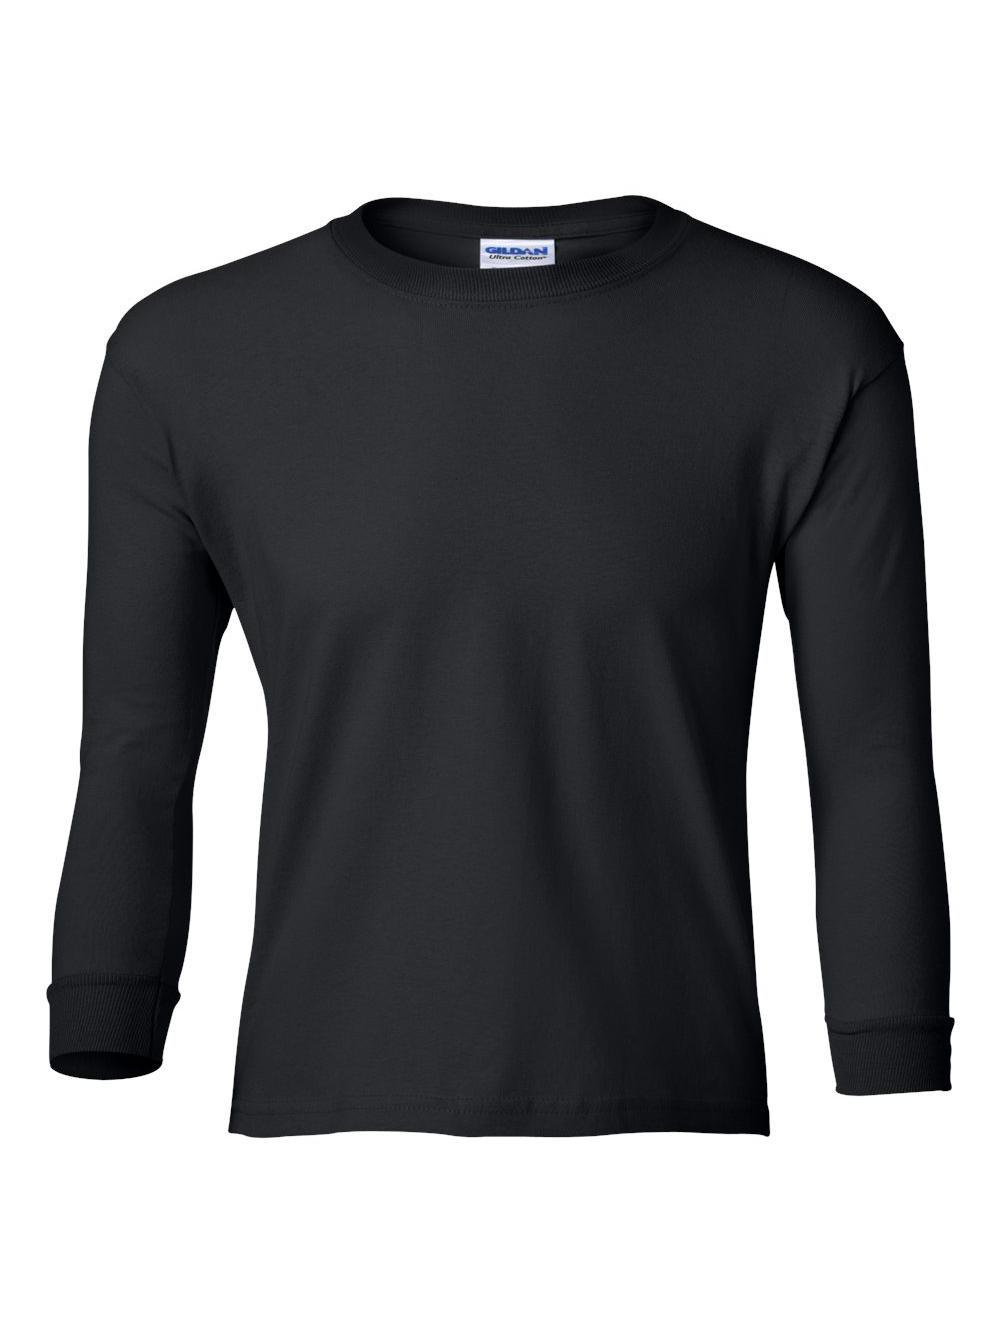 Gildan-Ultra-Cotton-Youth-Long-Sleeve-T-Shirt-2400B thumbnail 6